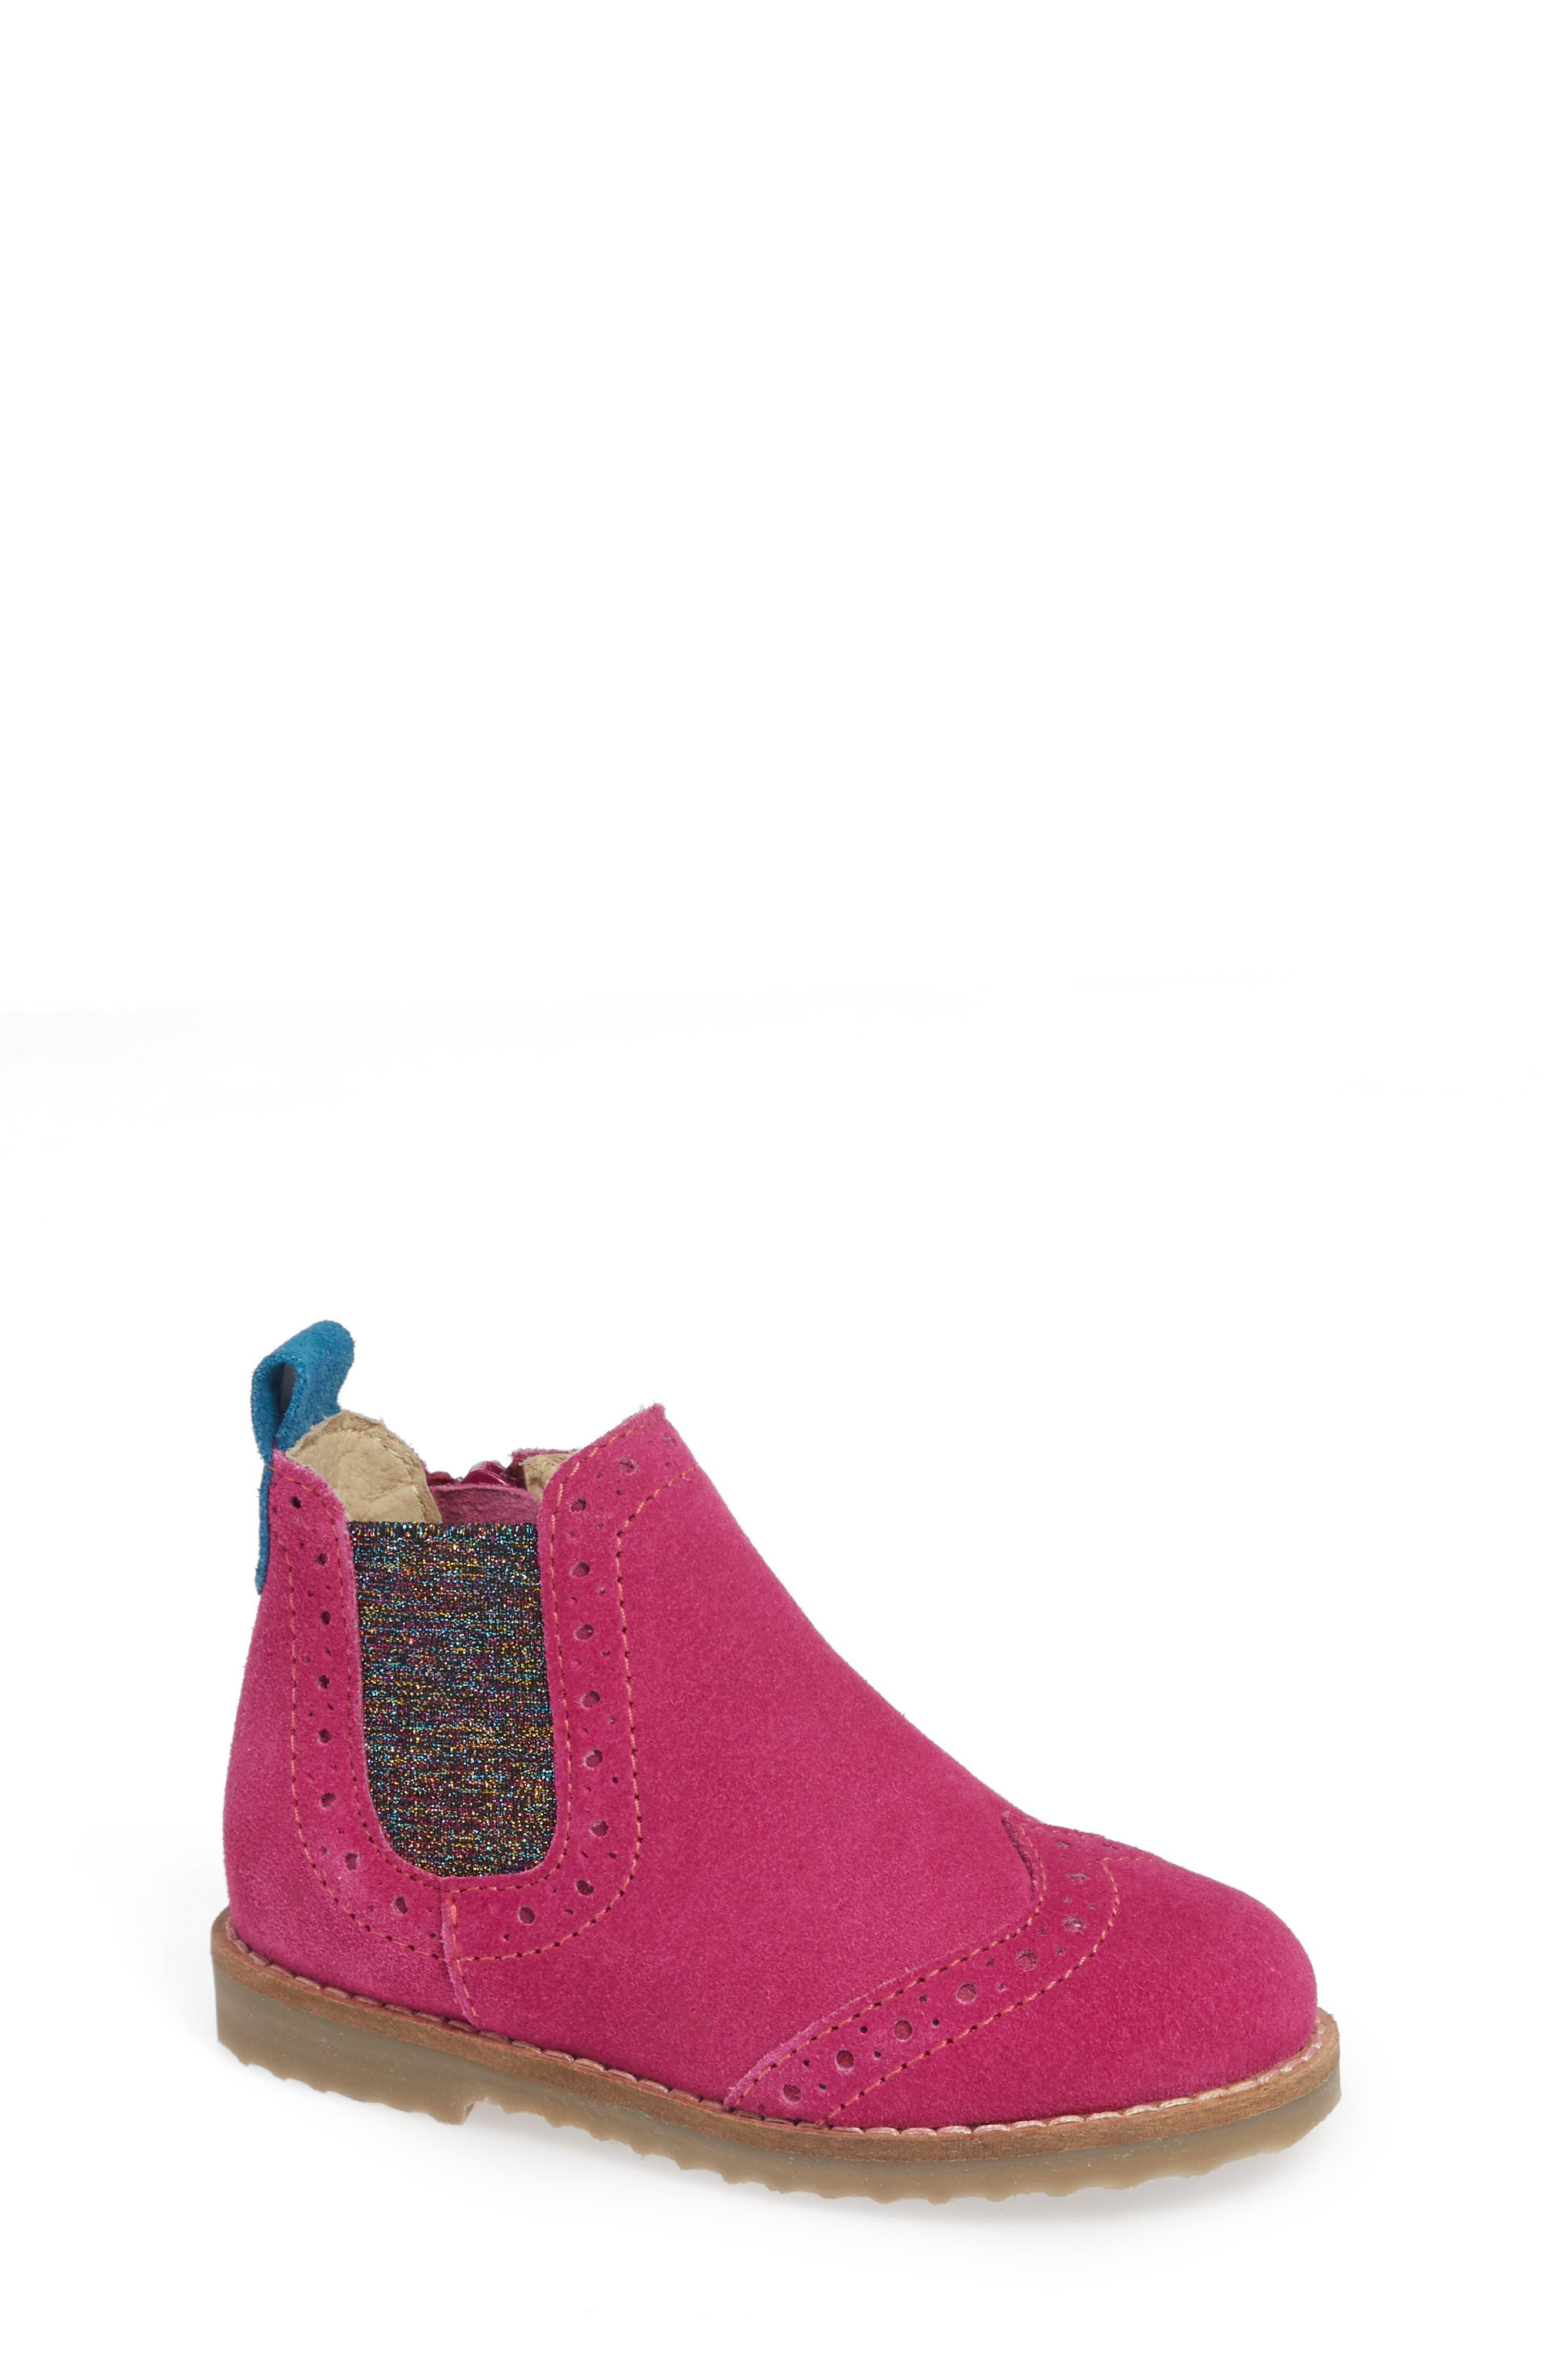 Chelsea Boot,                         Main,                         color, REGAL PURPLE